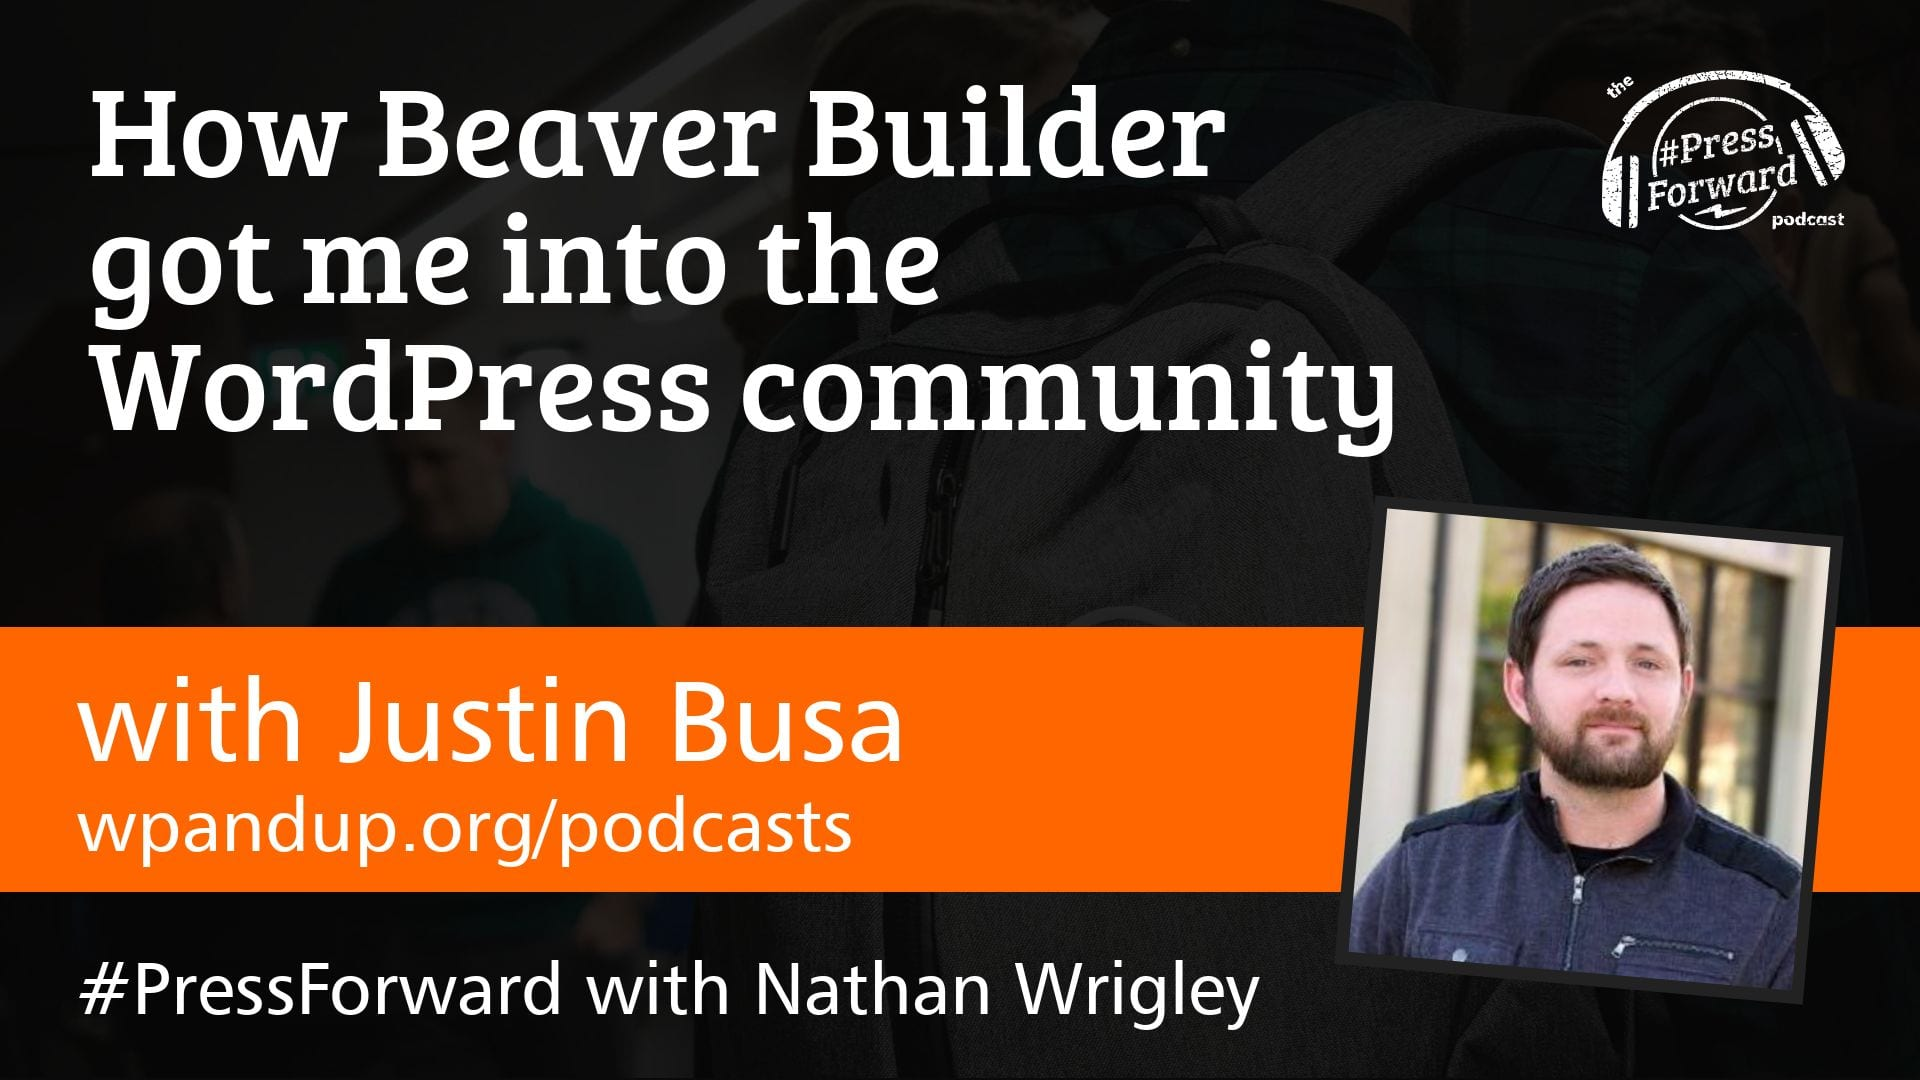 How Beaver Builder got me into the WordPress community - #025